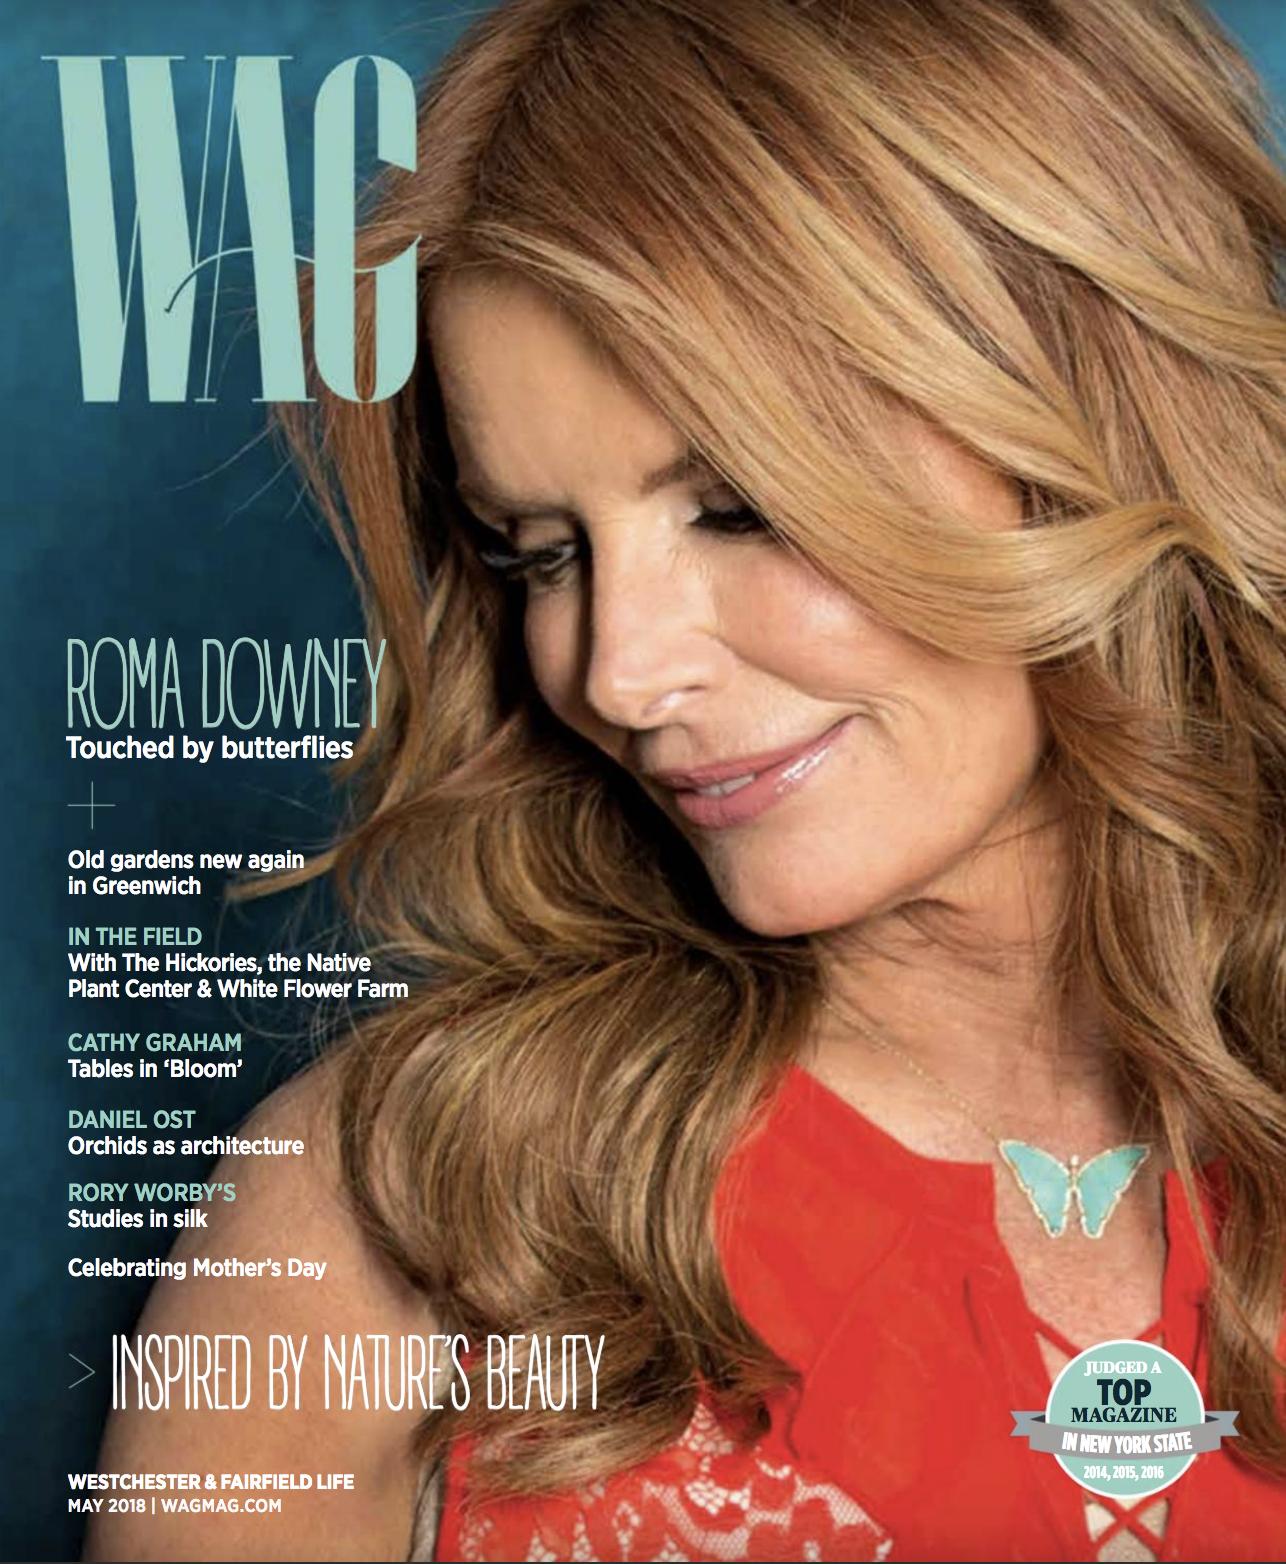 Cafe La Fondita - WAG Magazine - May 2018